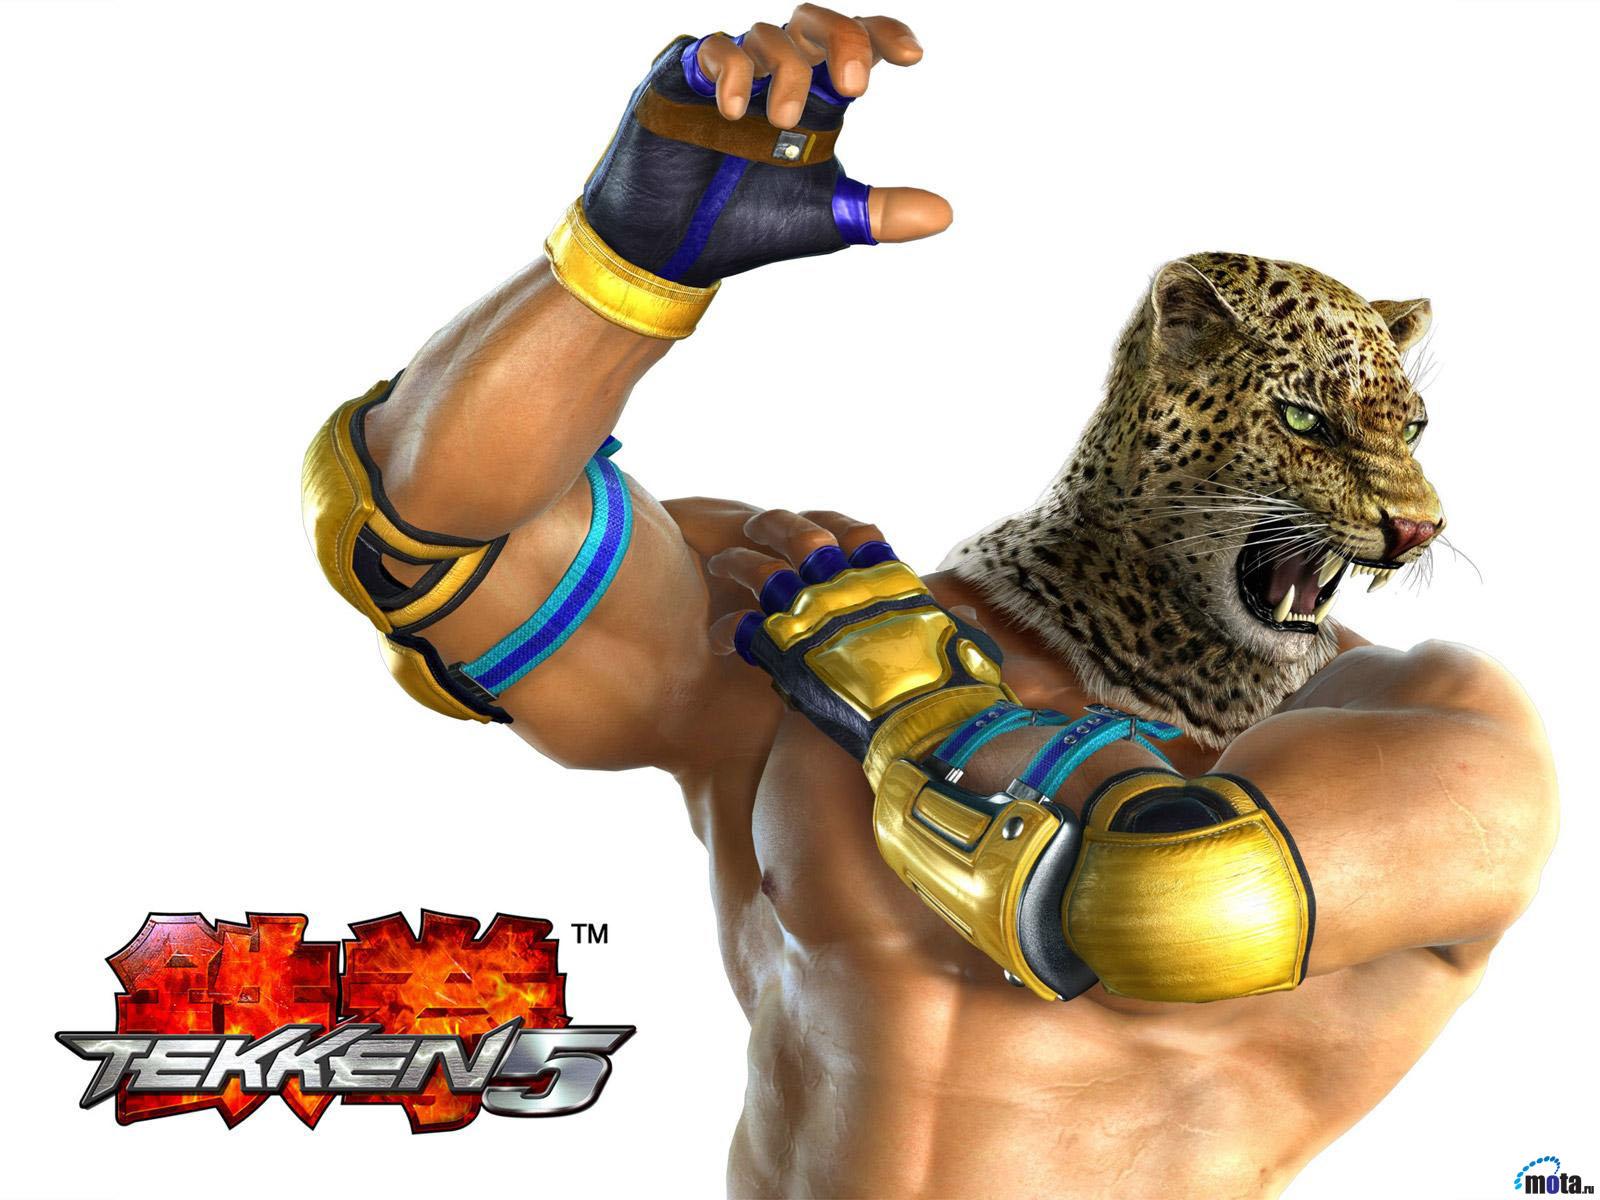 Wallpaper Tekken 5 Tekken King Tekken 5   King 1600x1200